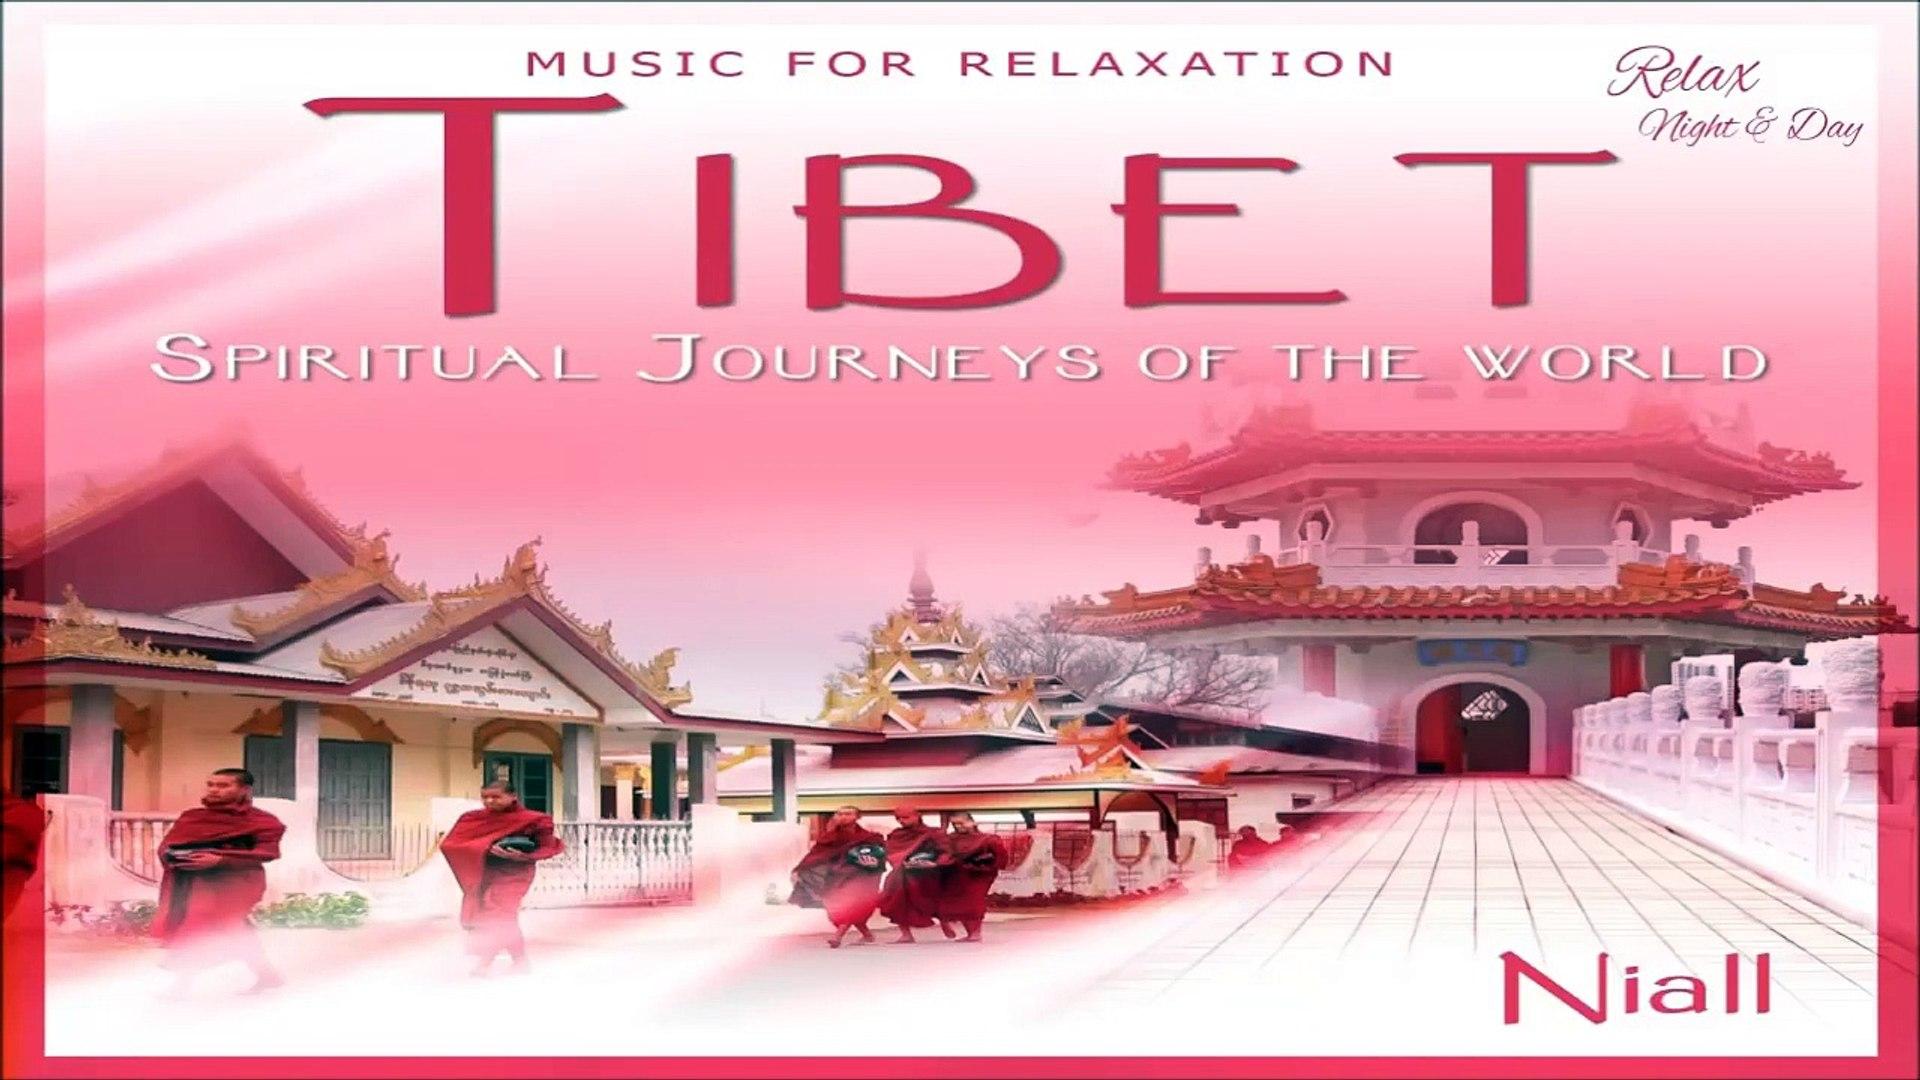 Beutiful Tibetan Music - Massage, Meditation, Yoga, Sleep, SPA, Spiritual Music, Spiritual Journeys